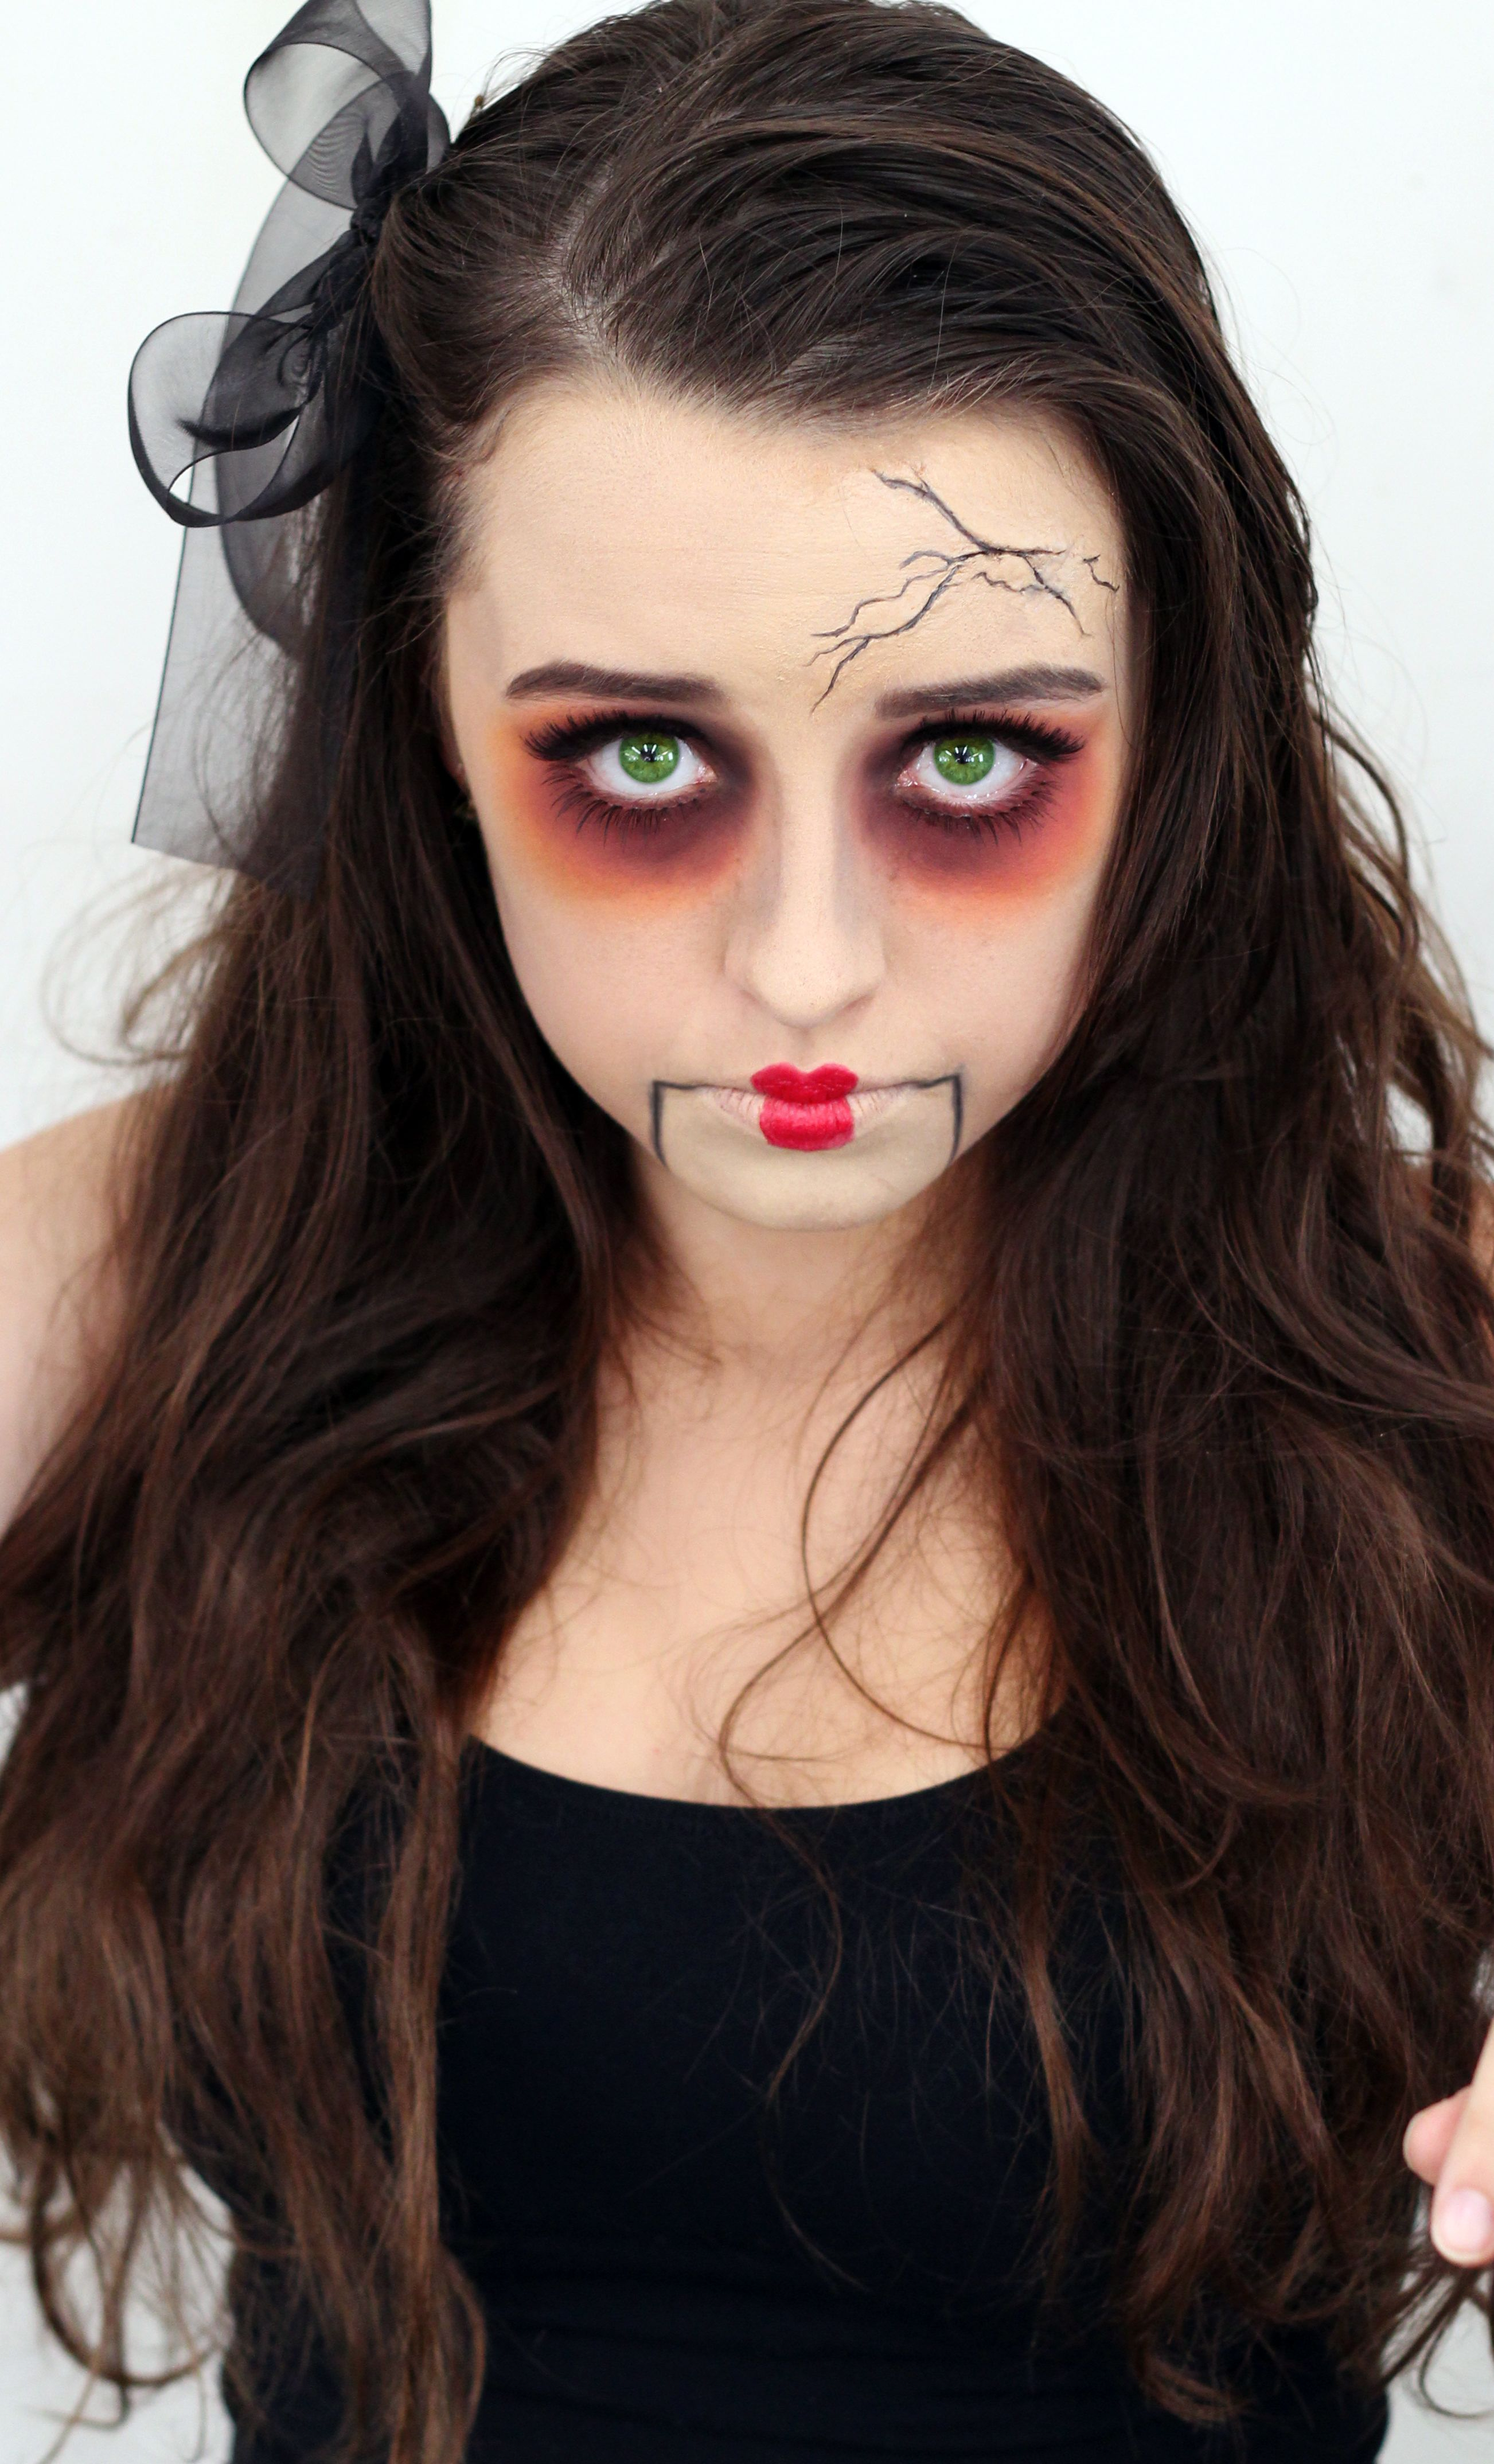 Broken Cracked Doll Makeup Halloween Doll Makeup Halloween Scary Doll Makeup Cracked Doll Makeup